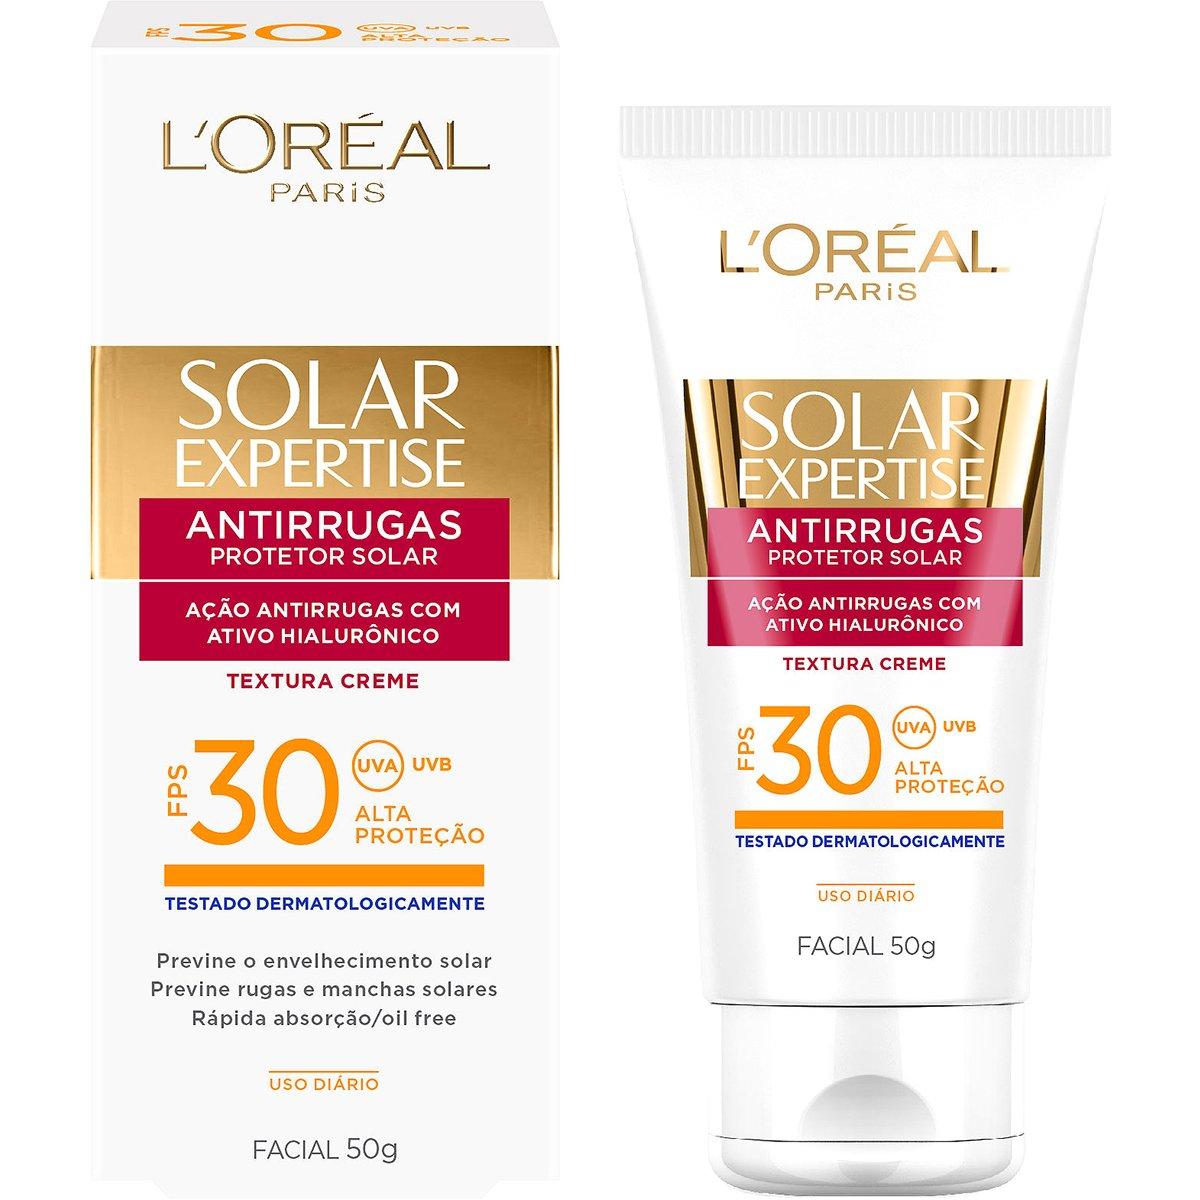 Protetor Facial L'Oréal Paris Solar Expertise Antirrugas FPS 30 50g